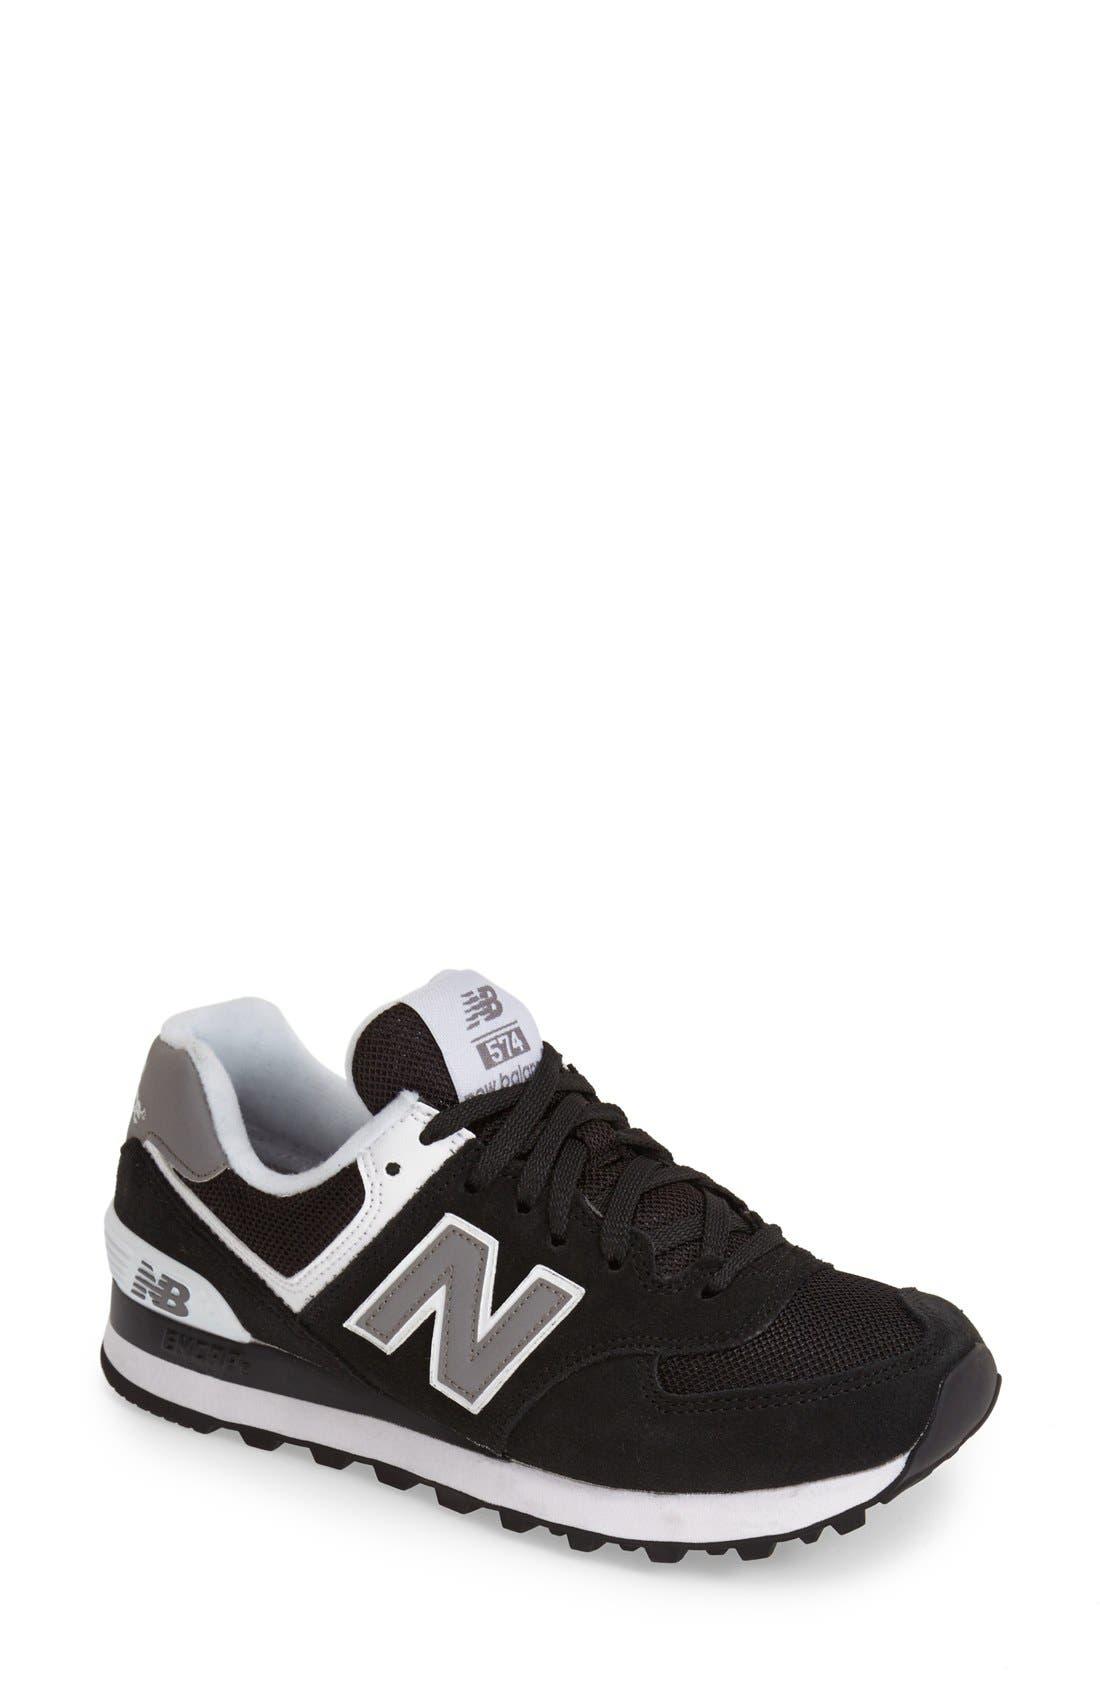 Main Image - New Balance '574 Classic' Sneaker (Women)